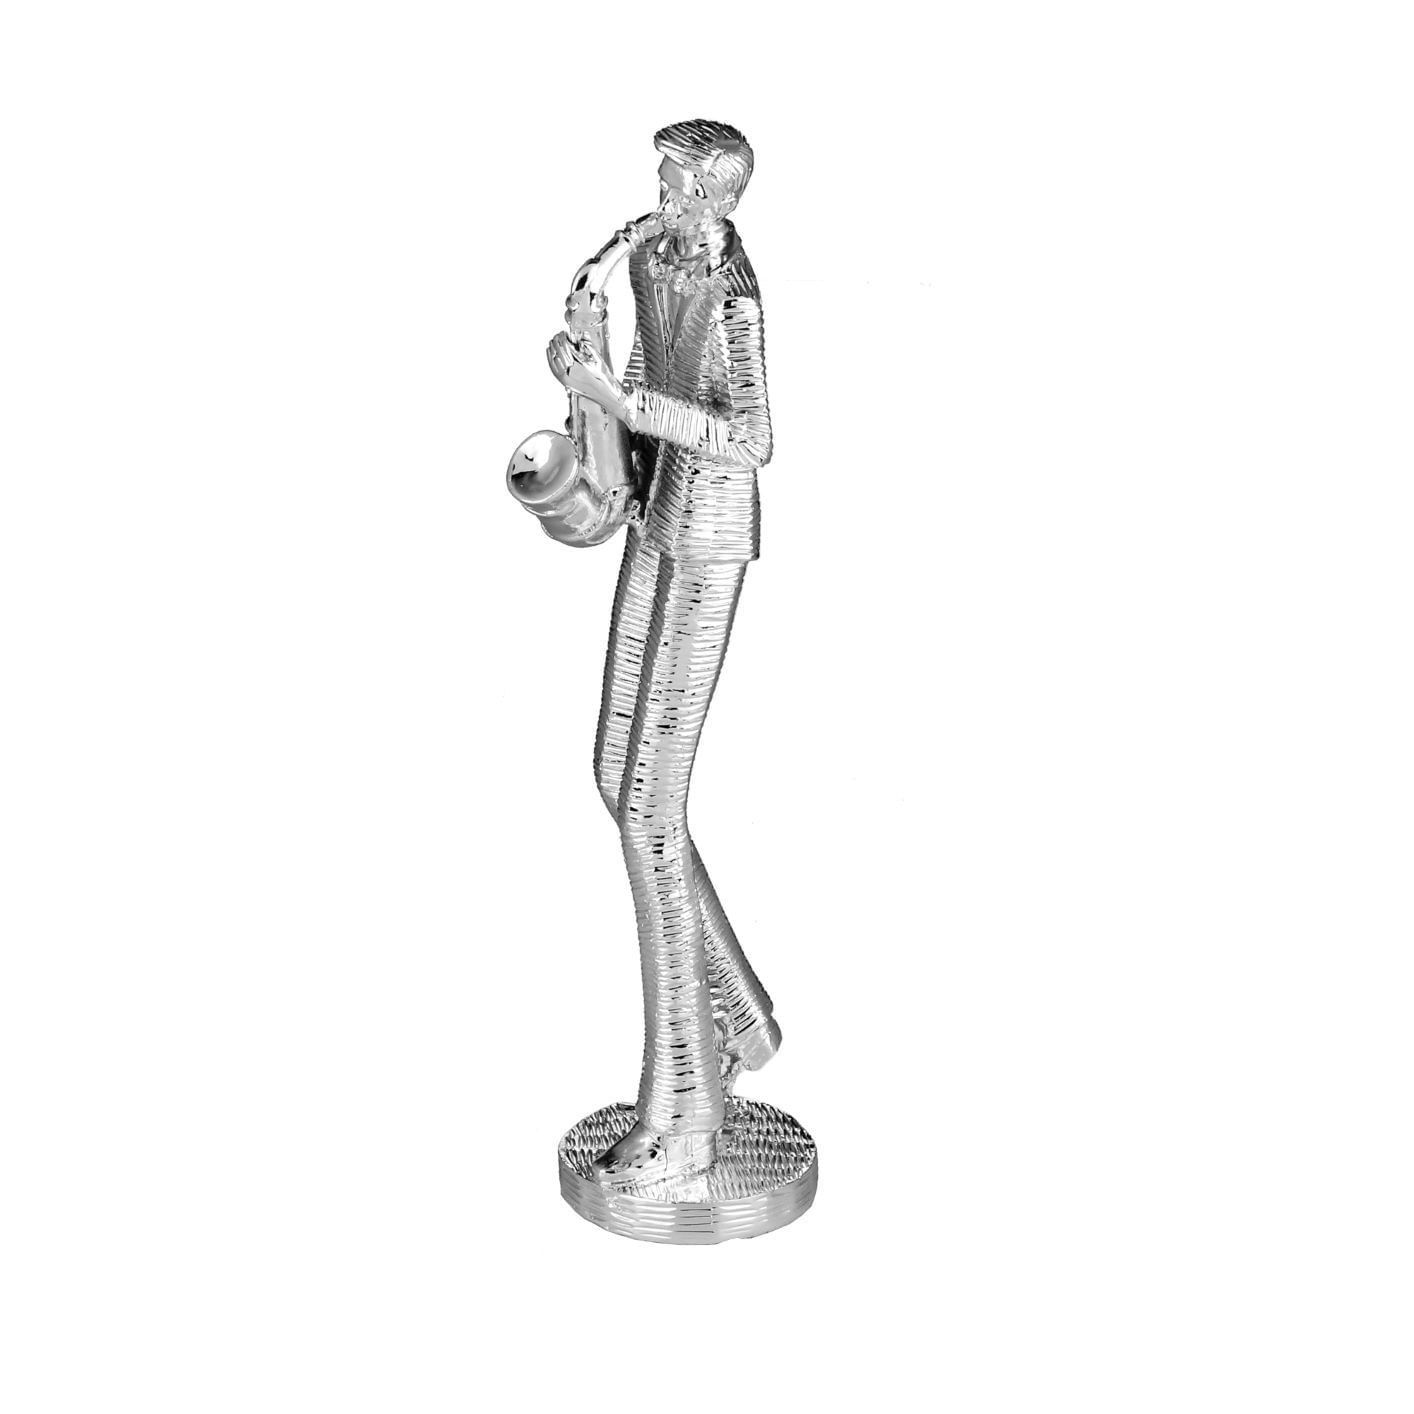 Estatueta Decorativa Músico Tocando Saxofone - Resina Prata